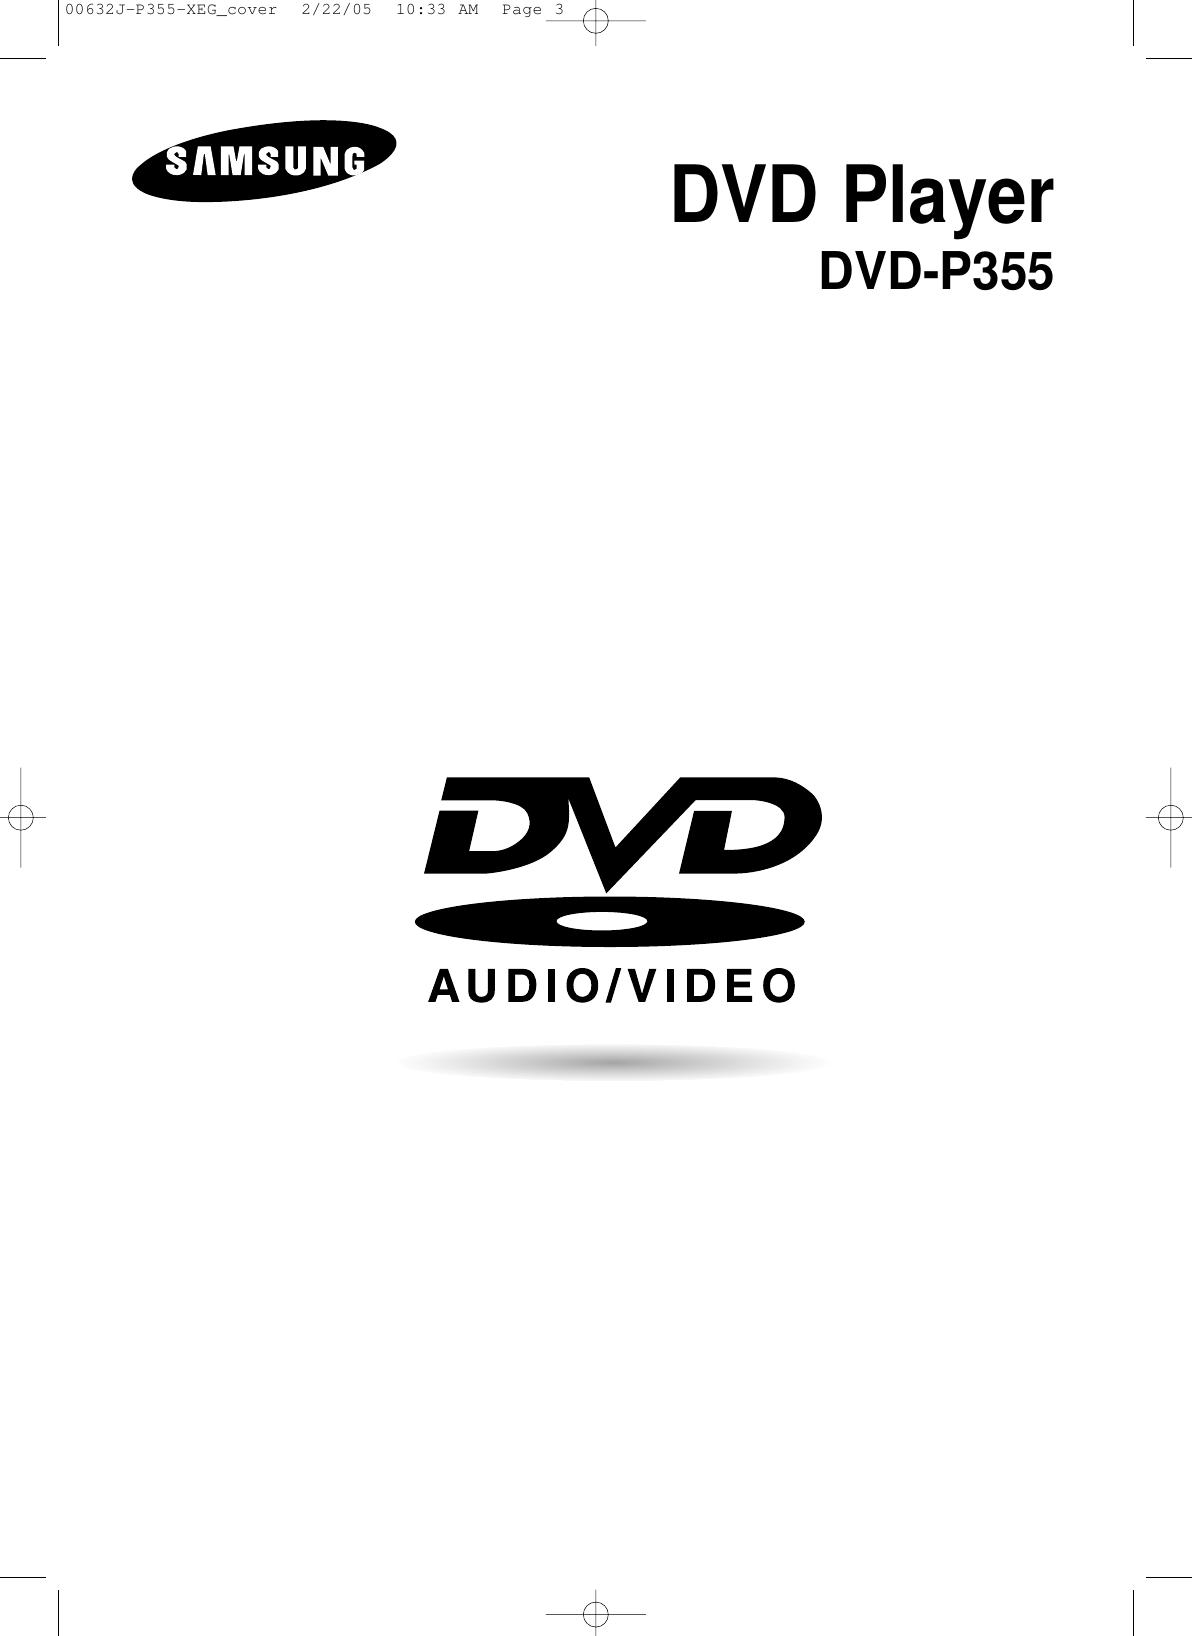 Samsung DVD P355 20050817202817359 SED 0222